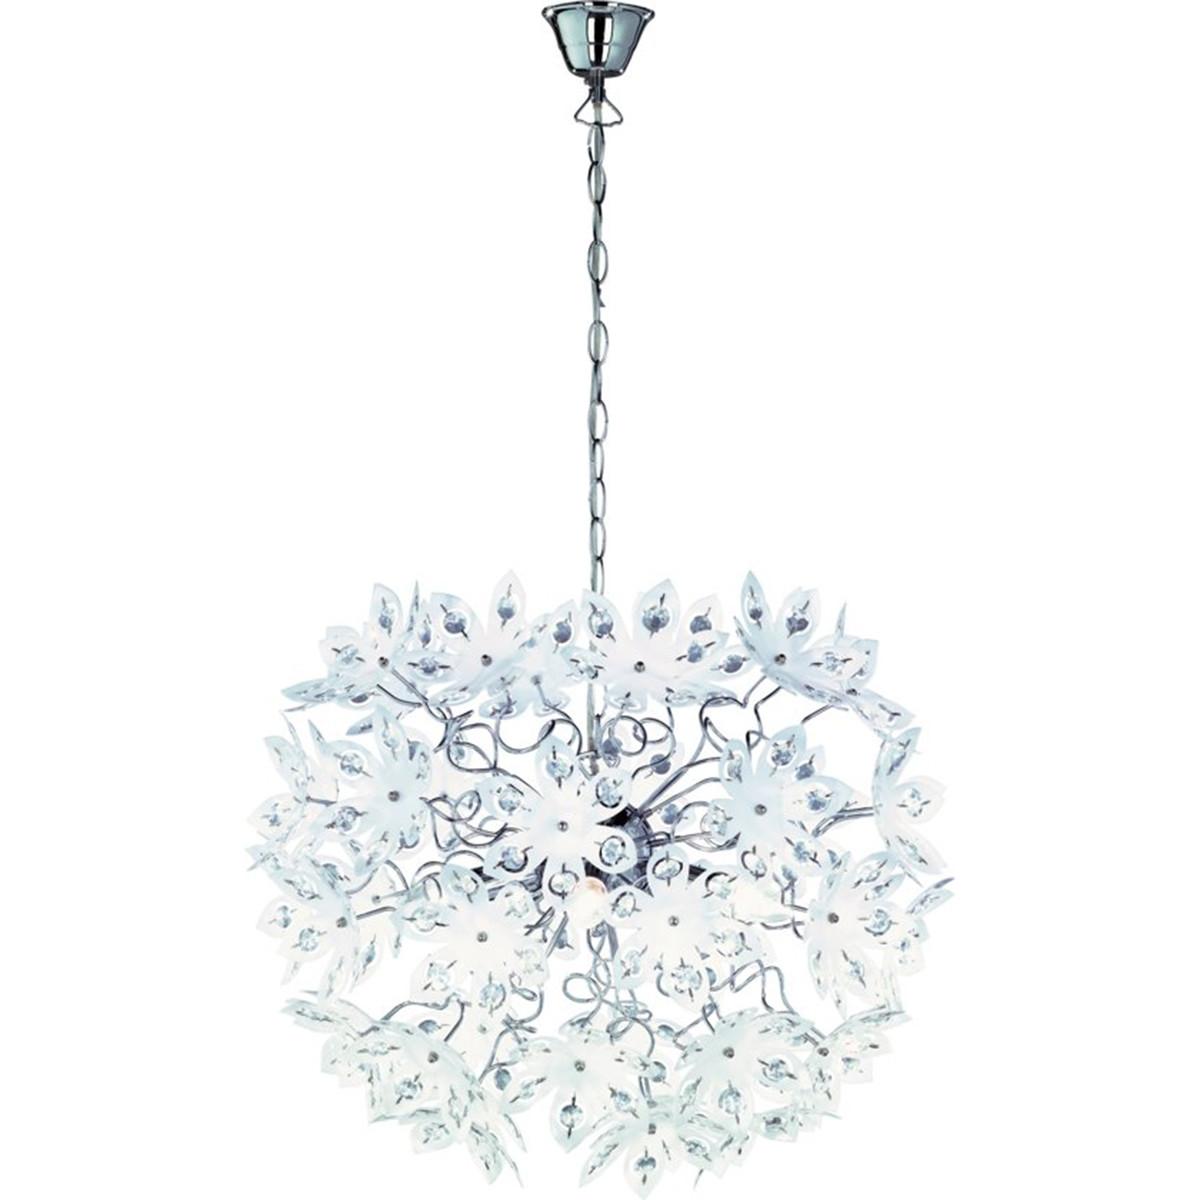 LED Hanglamp - Trion Blowly - E14 Fitting - 5-lichts - Rond - Glans Chroom - Aluminium